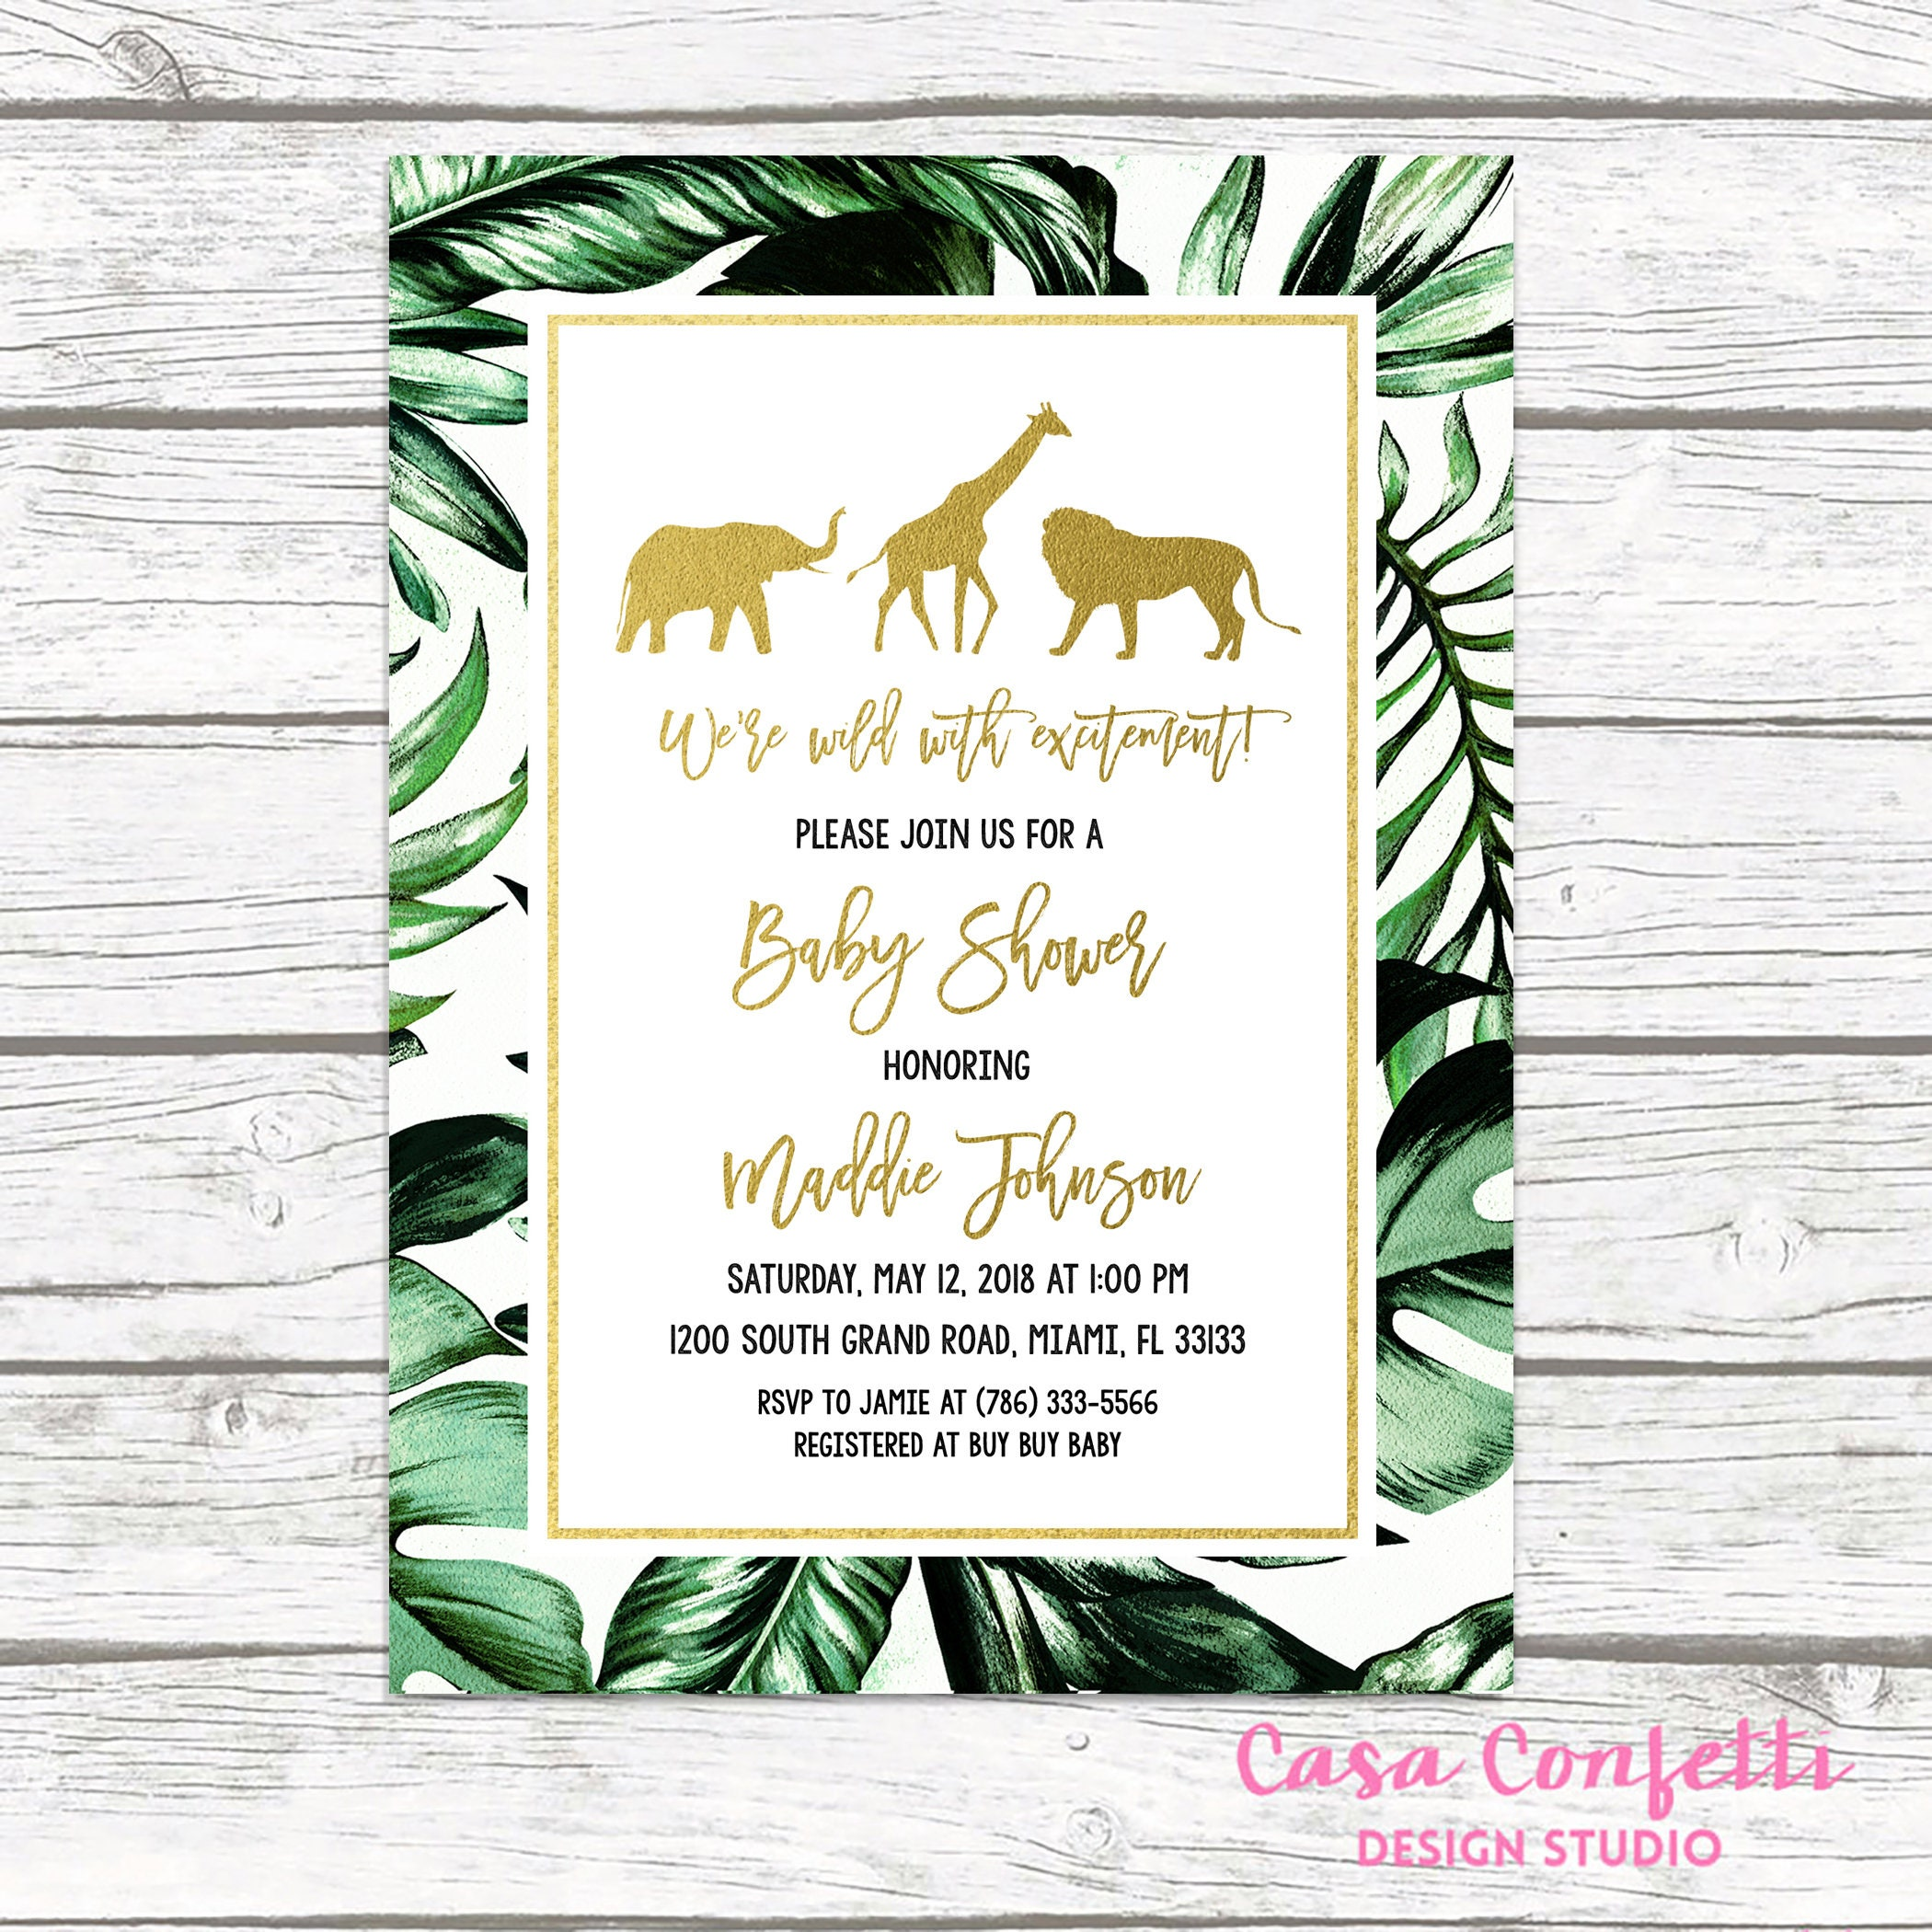 Safari Baby Shower Invitation: Safari Baby Shower Invitation, Gold Safari Baby Shower